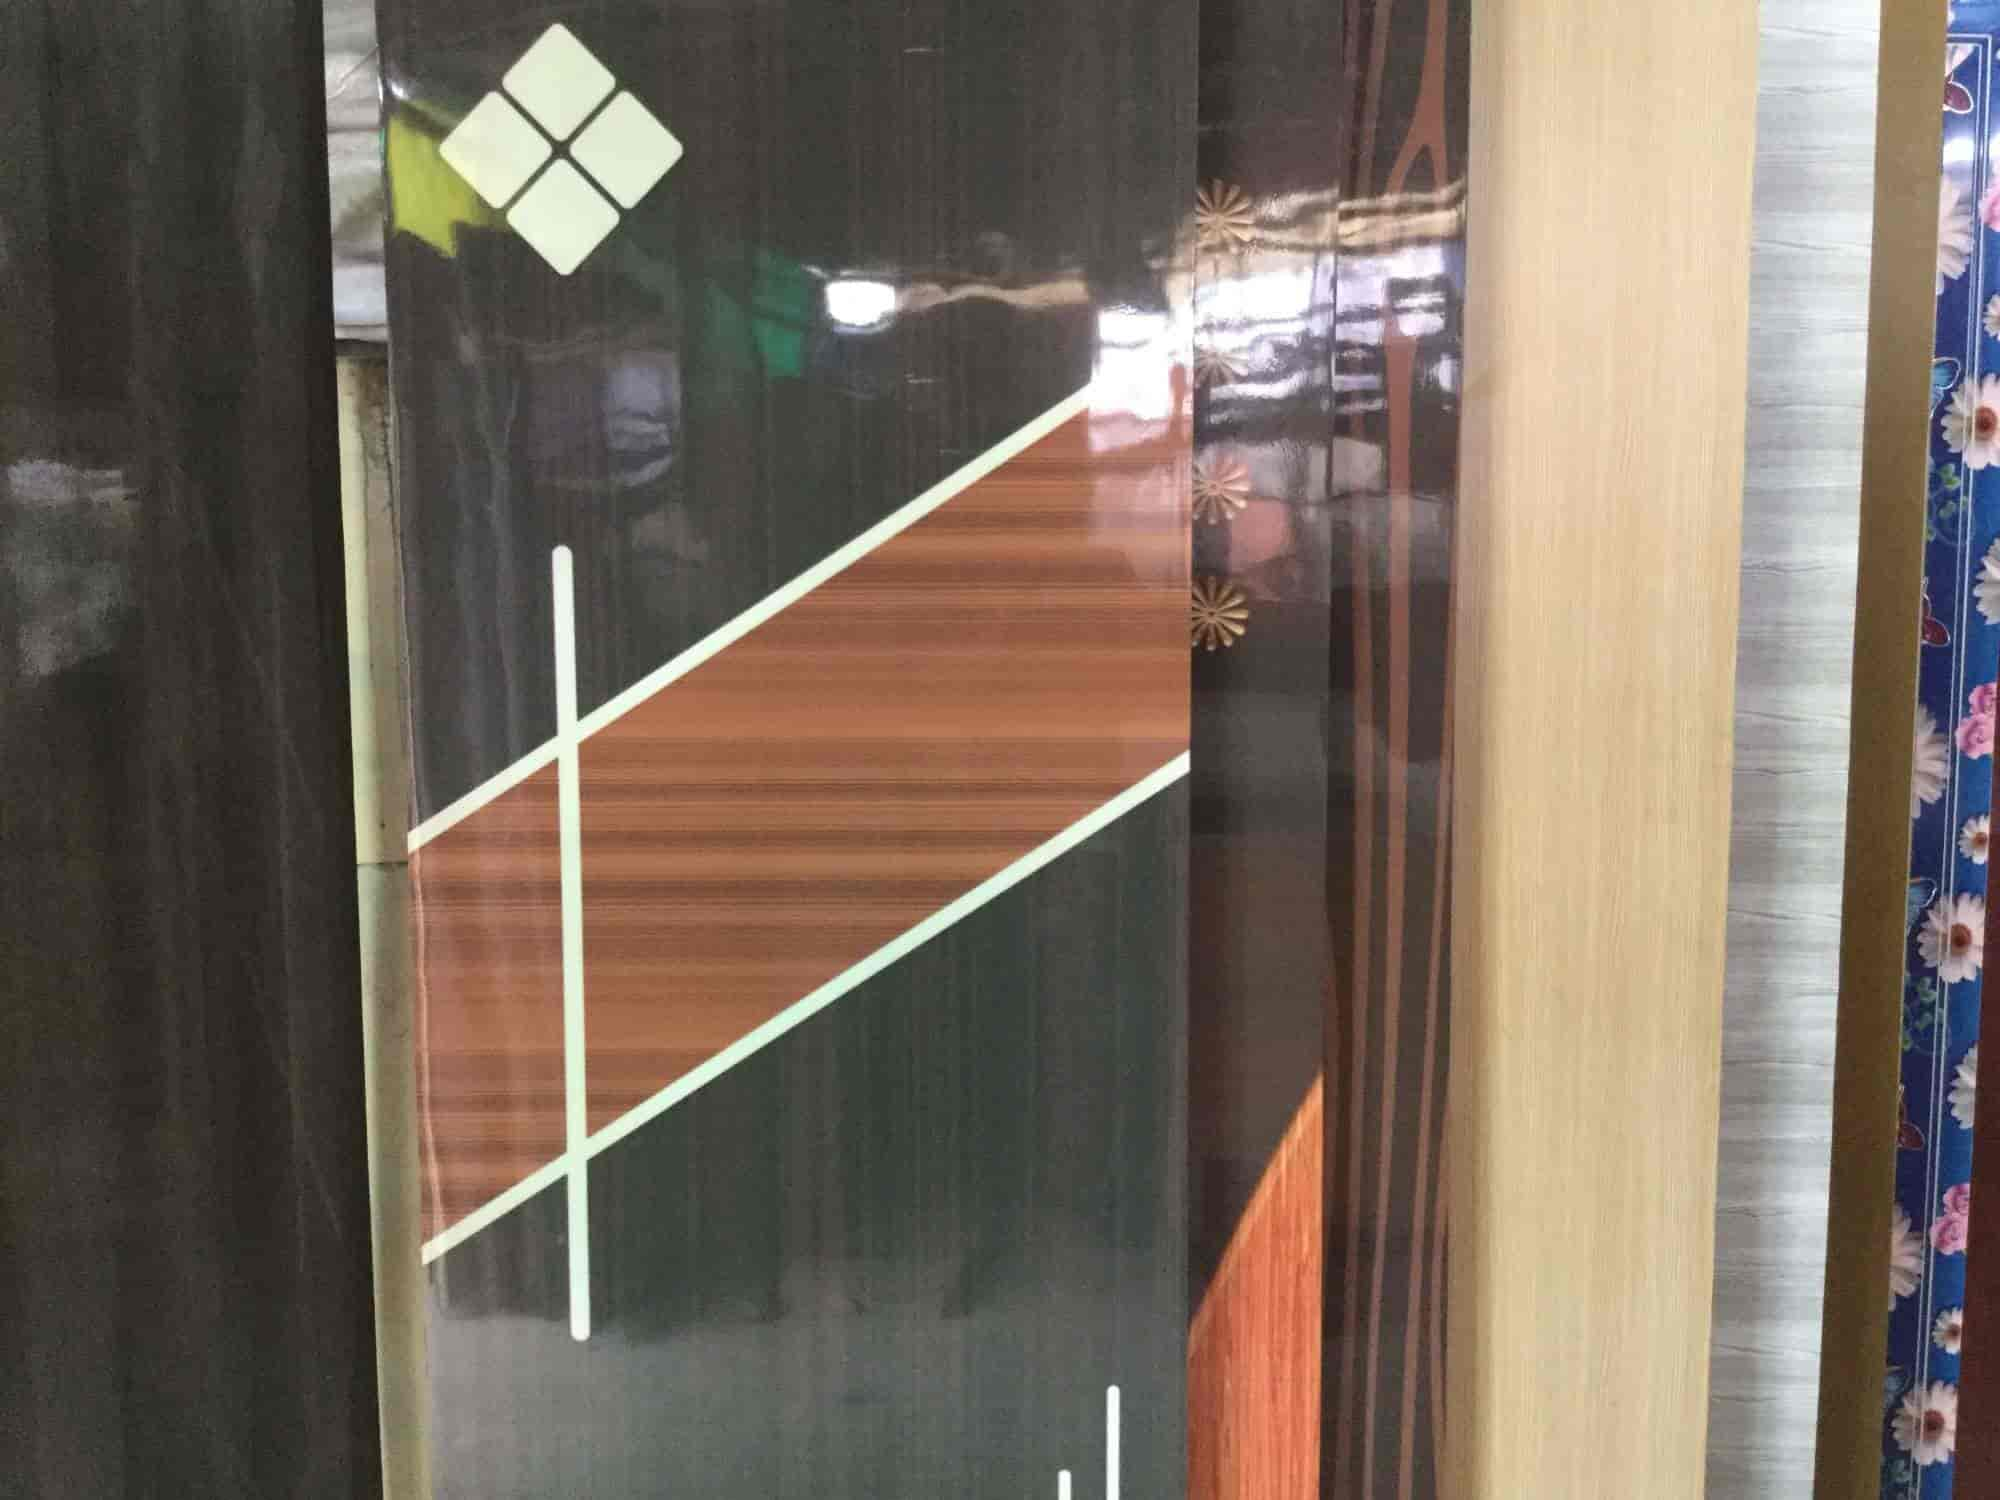 ... PVC Door - New Narendra Trade Link Photos Hingana Road Nagpur - False Ceiling ... & New Narendra Trade Link Photos Hingana Road Nagpur- Pictures ...